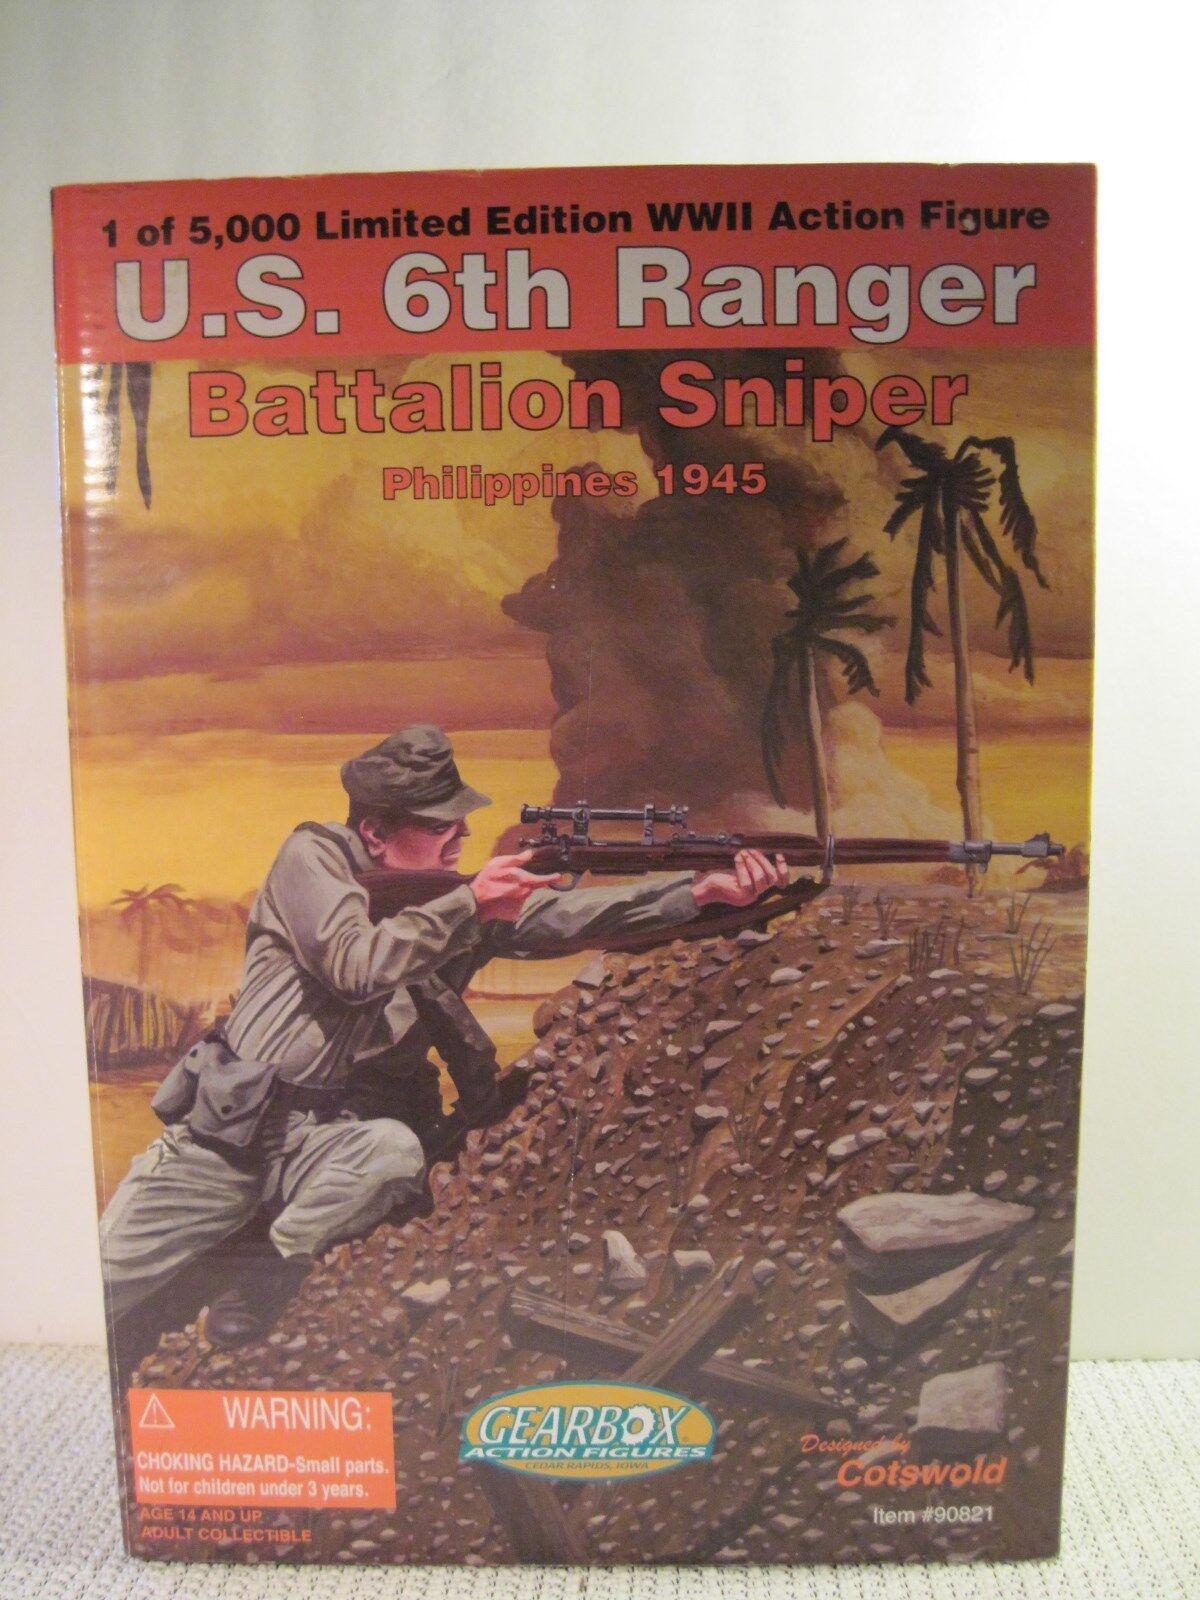 12  GEARBOX ACTION FIGURE U.S. 6th RANGER BATTALION SNIPER